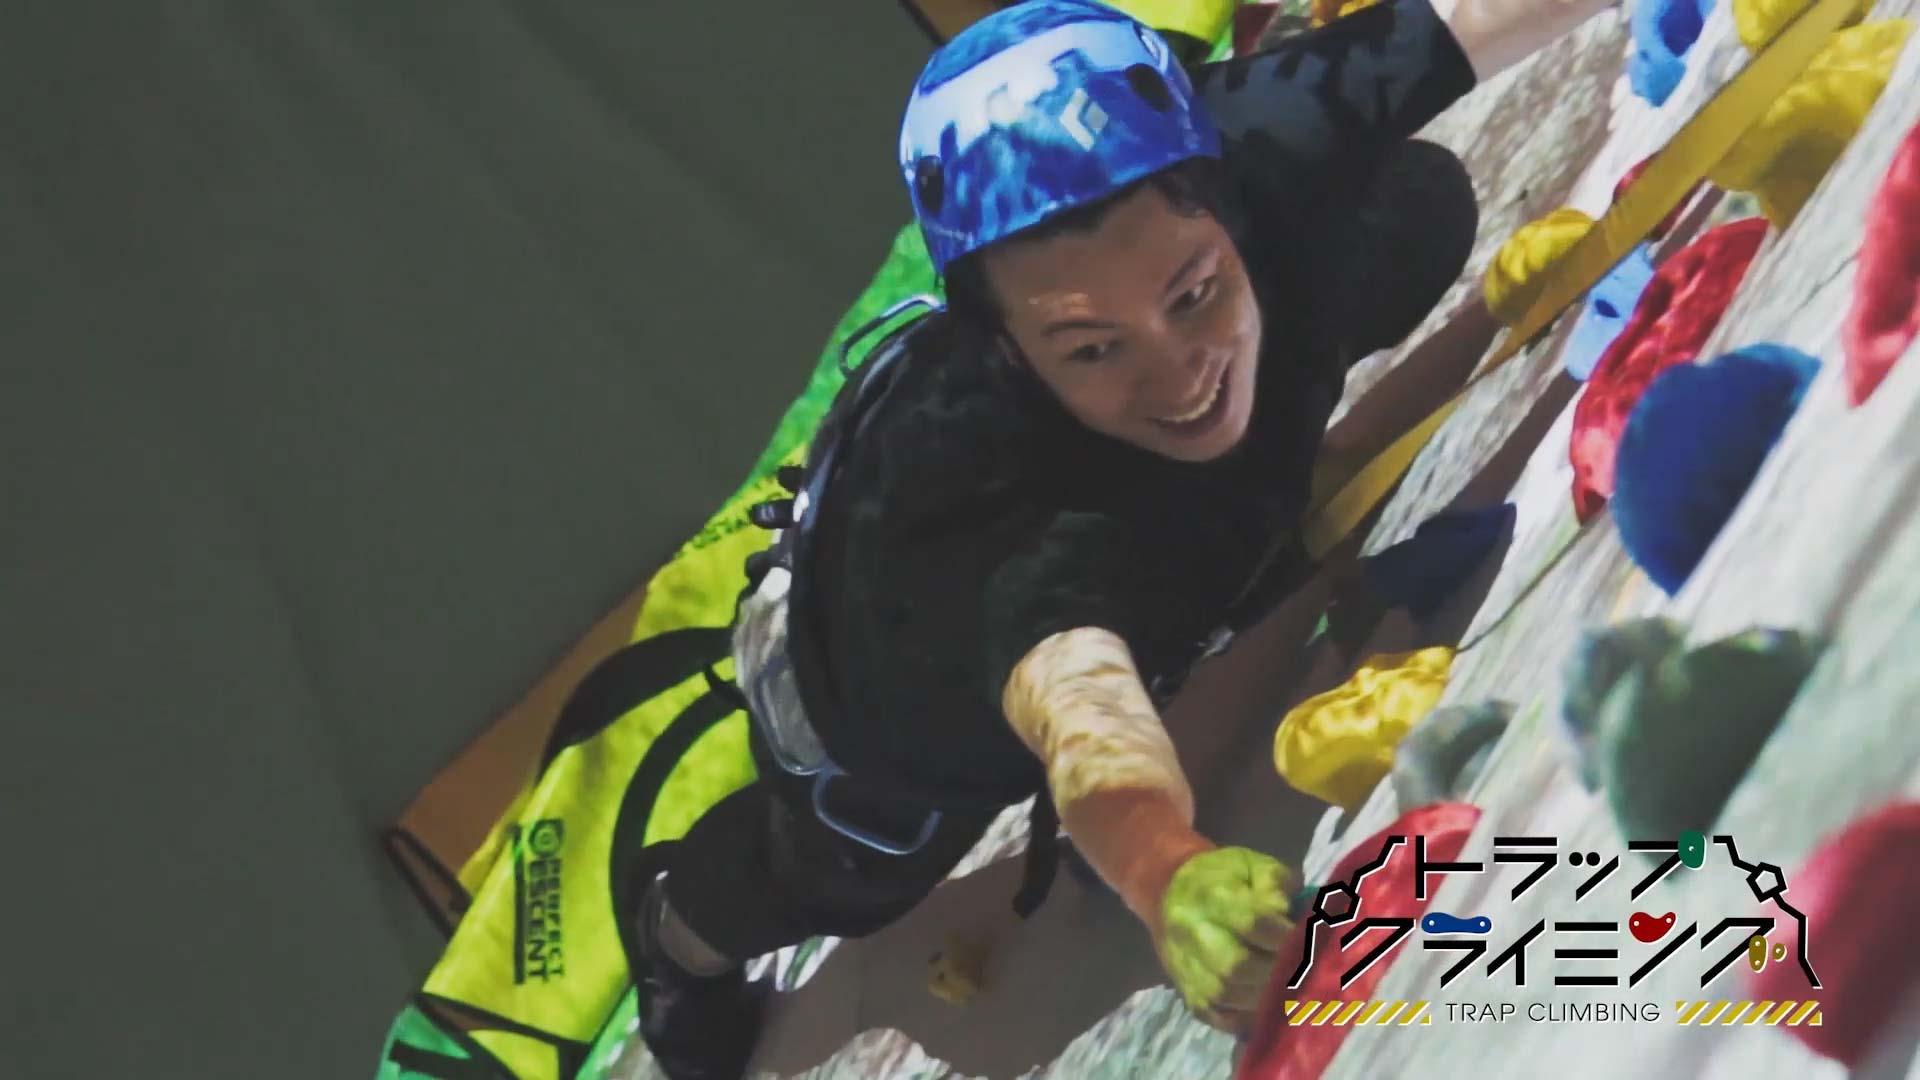 VR ZONE SHINJUKU バーチャルリゾートアクティビティ「ナイアガラドロップ & トラップクライミング」